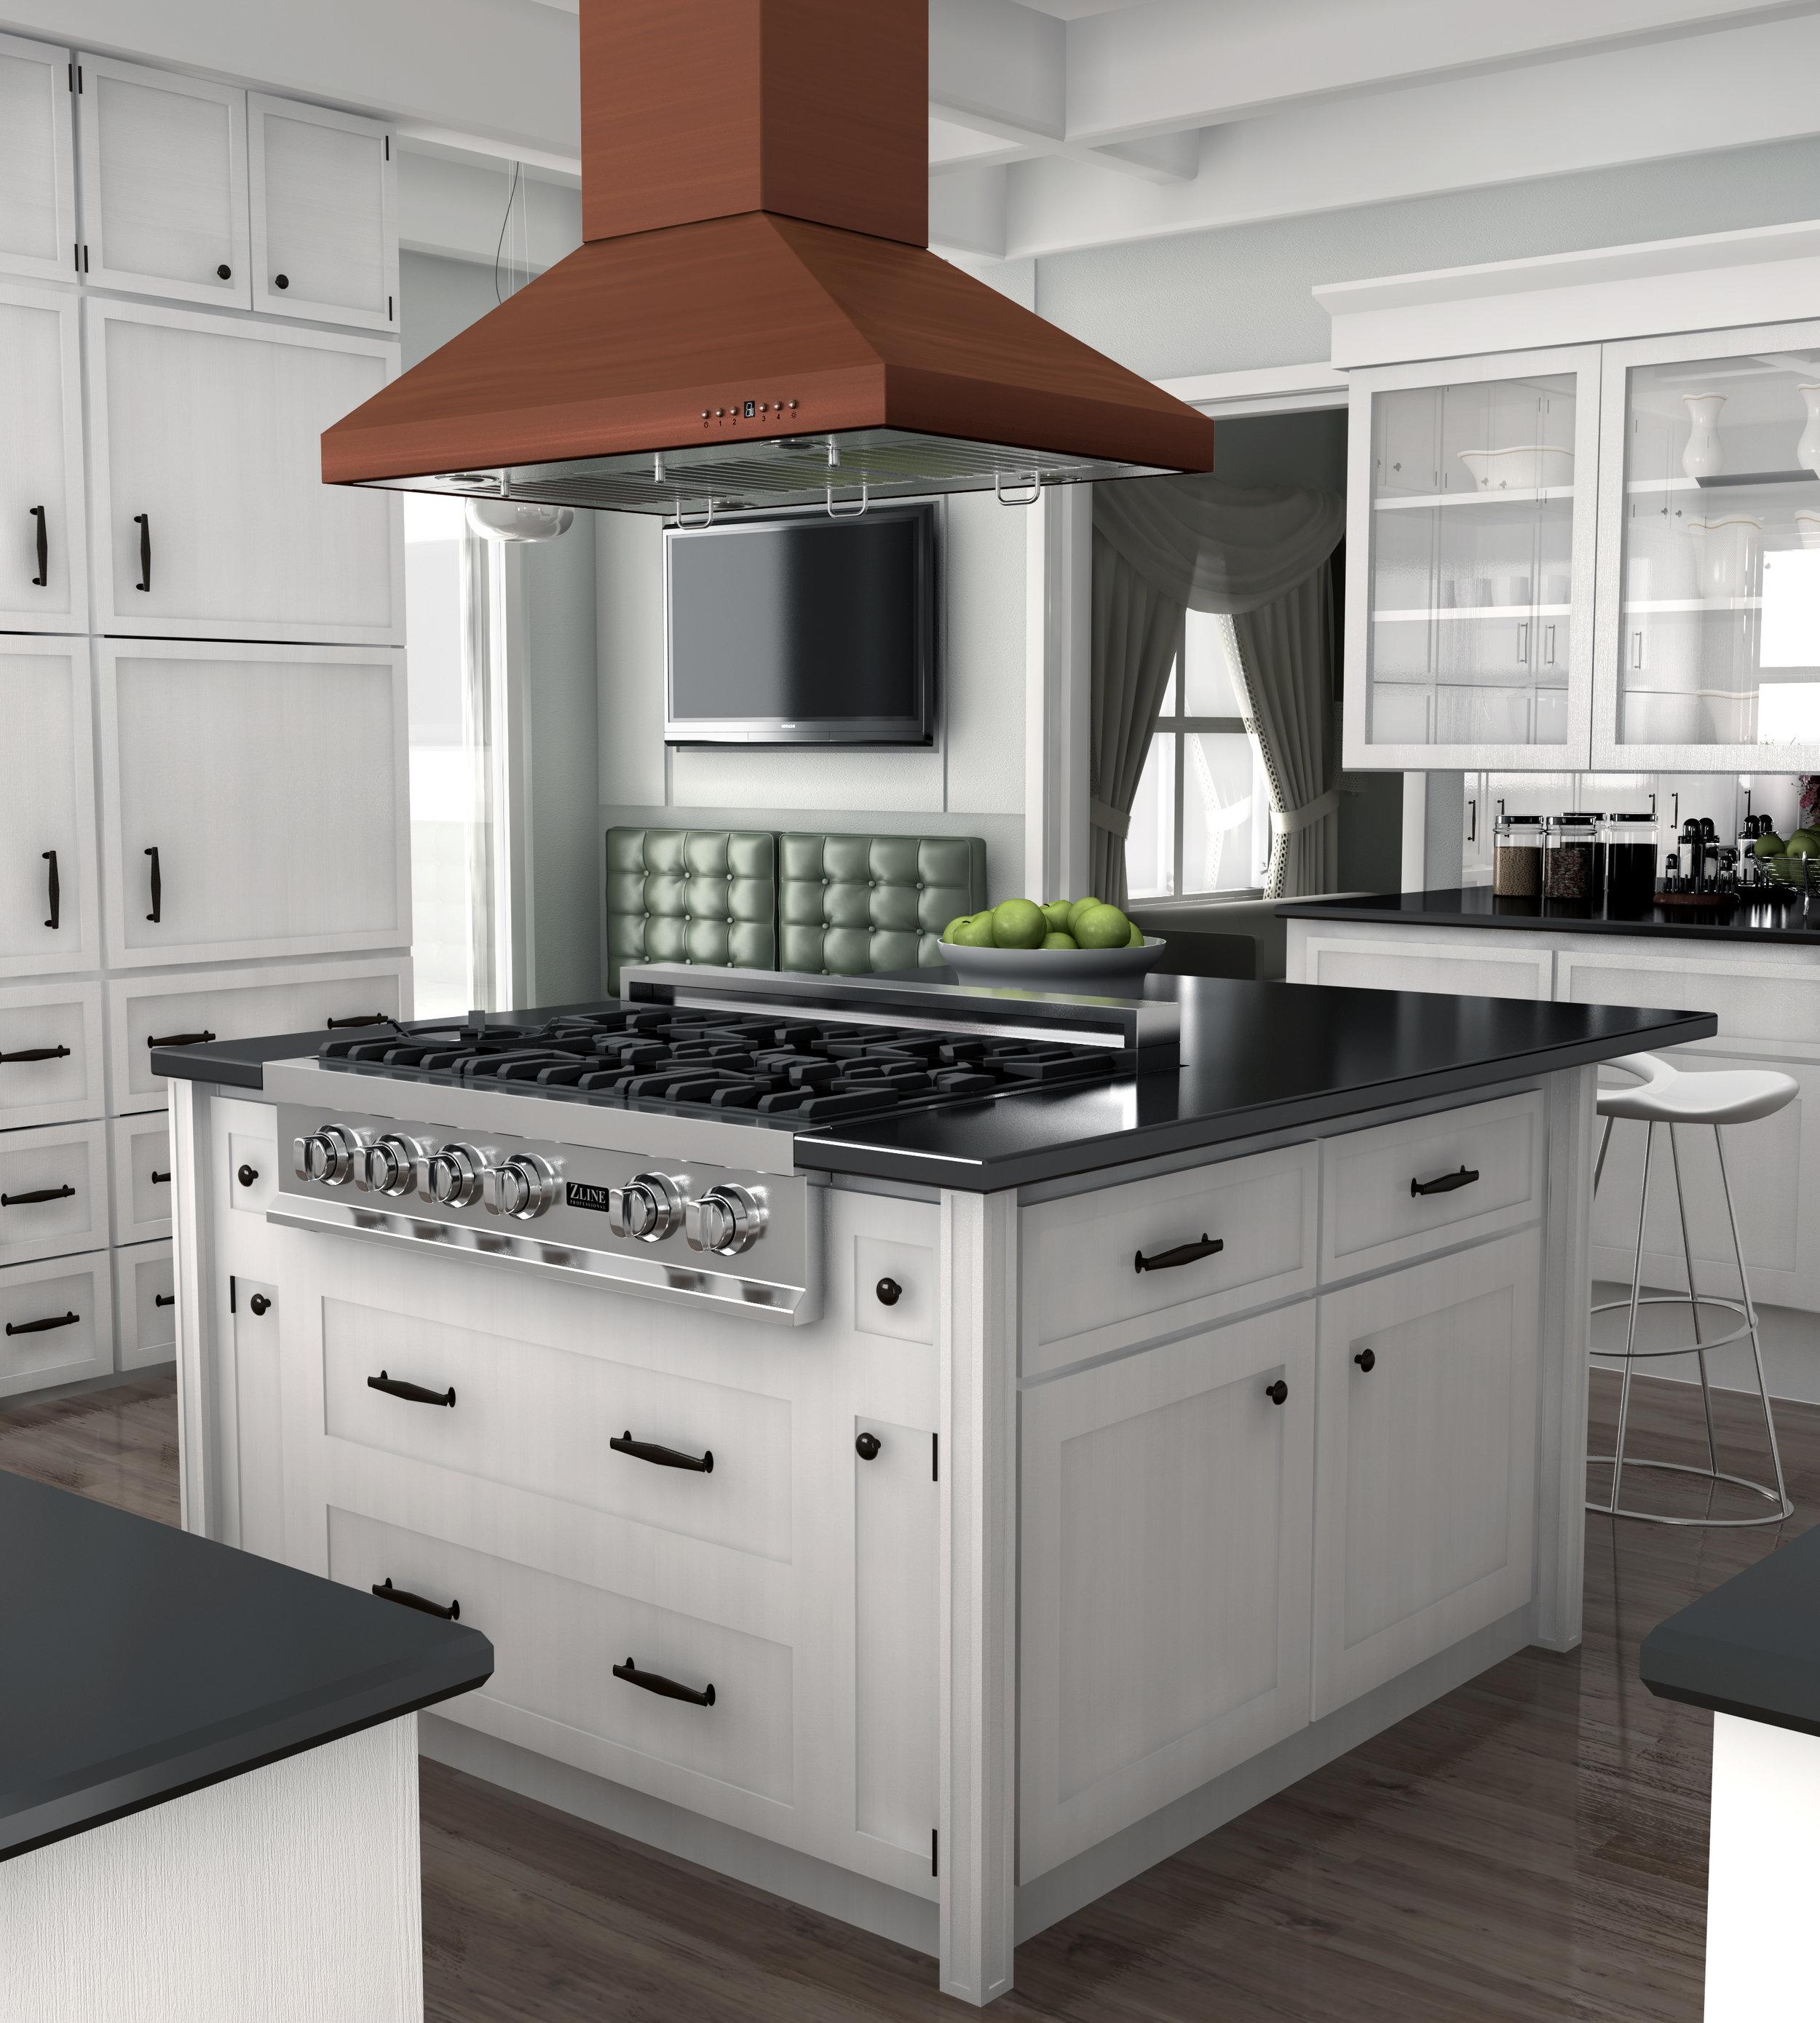 zline-copper-island-mounted-range-hood-8kl3ic-kitchen-new-1.jpg